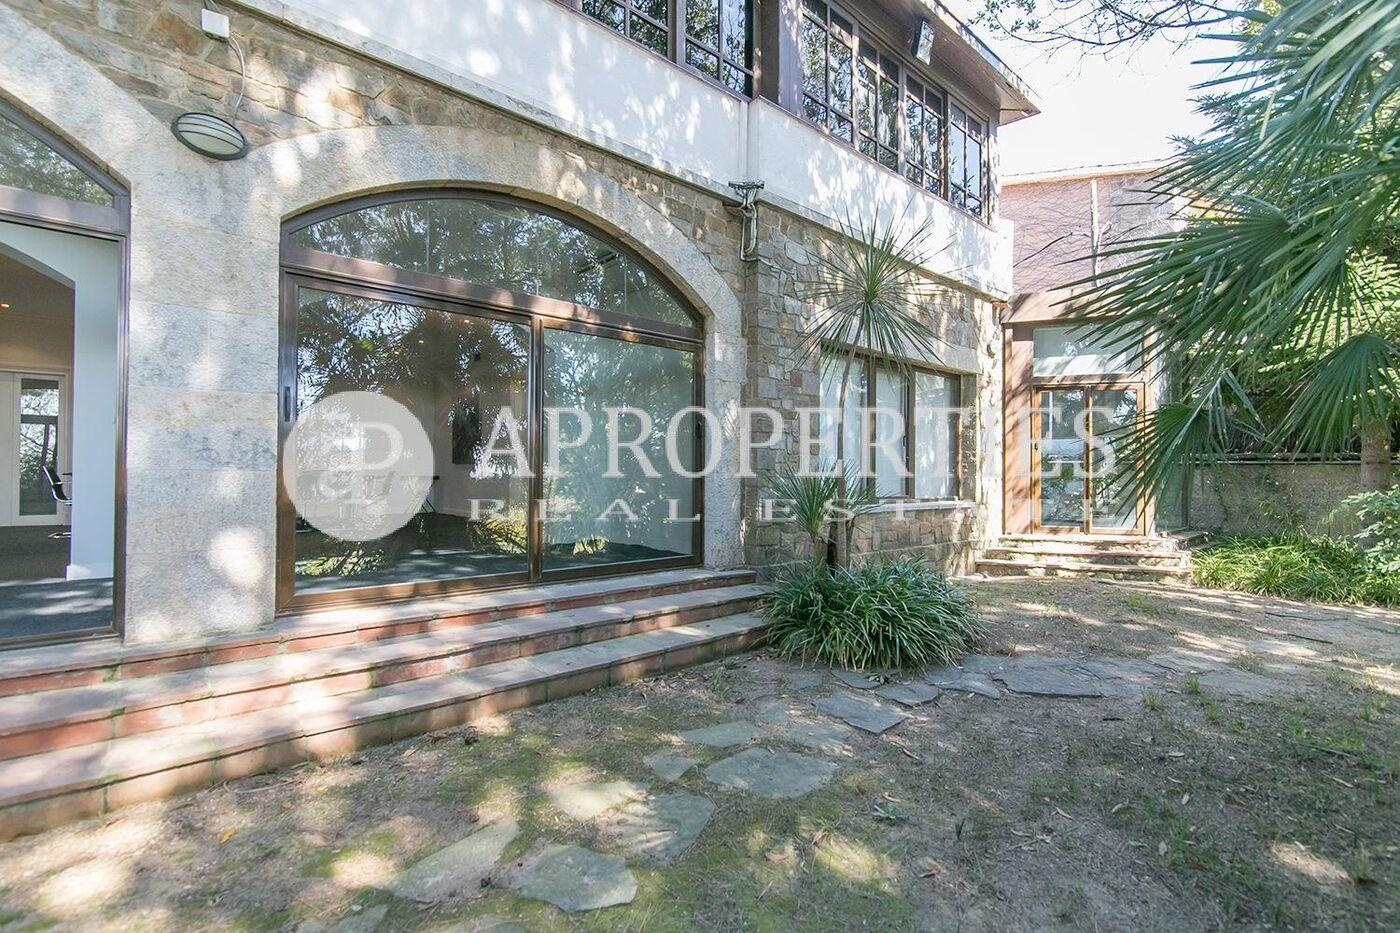 Casa en alquiler con jard n de 1500m2 en pedralbes for Casa con jardin barcelona alquiler